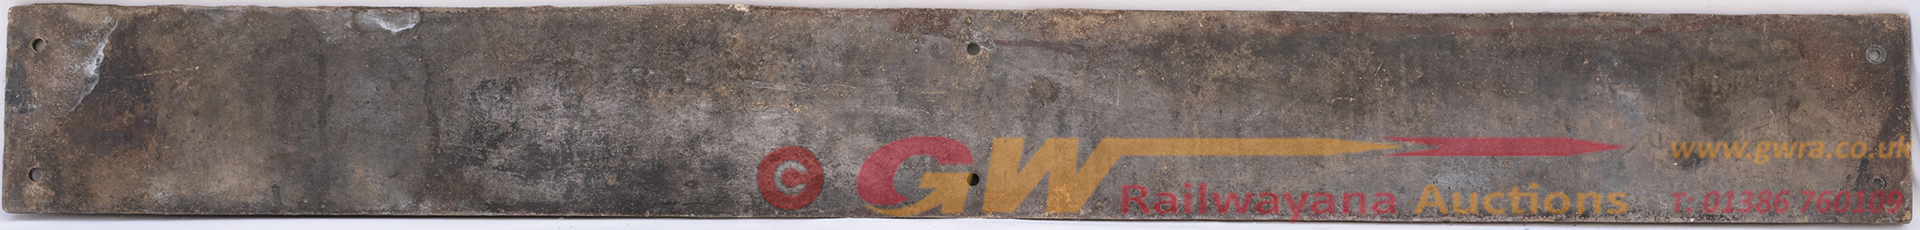 Nameplate SIR GEOFFREY ARCHER EX East African